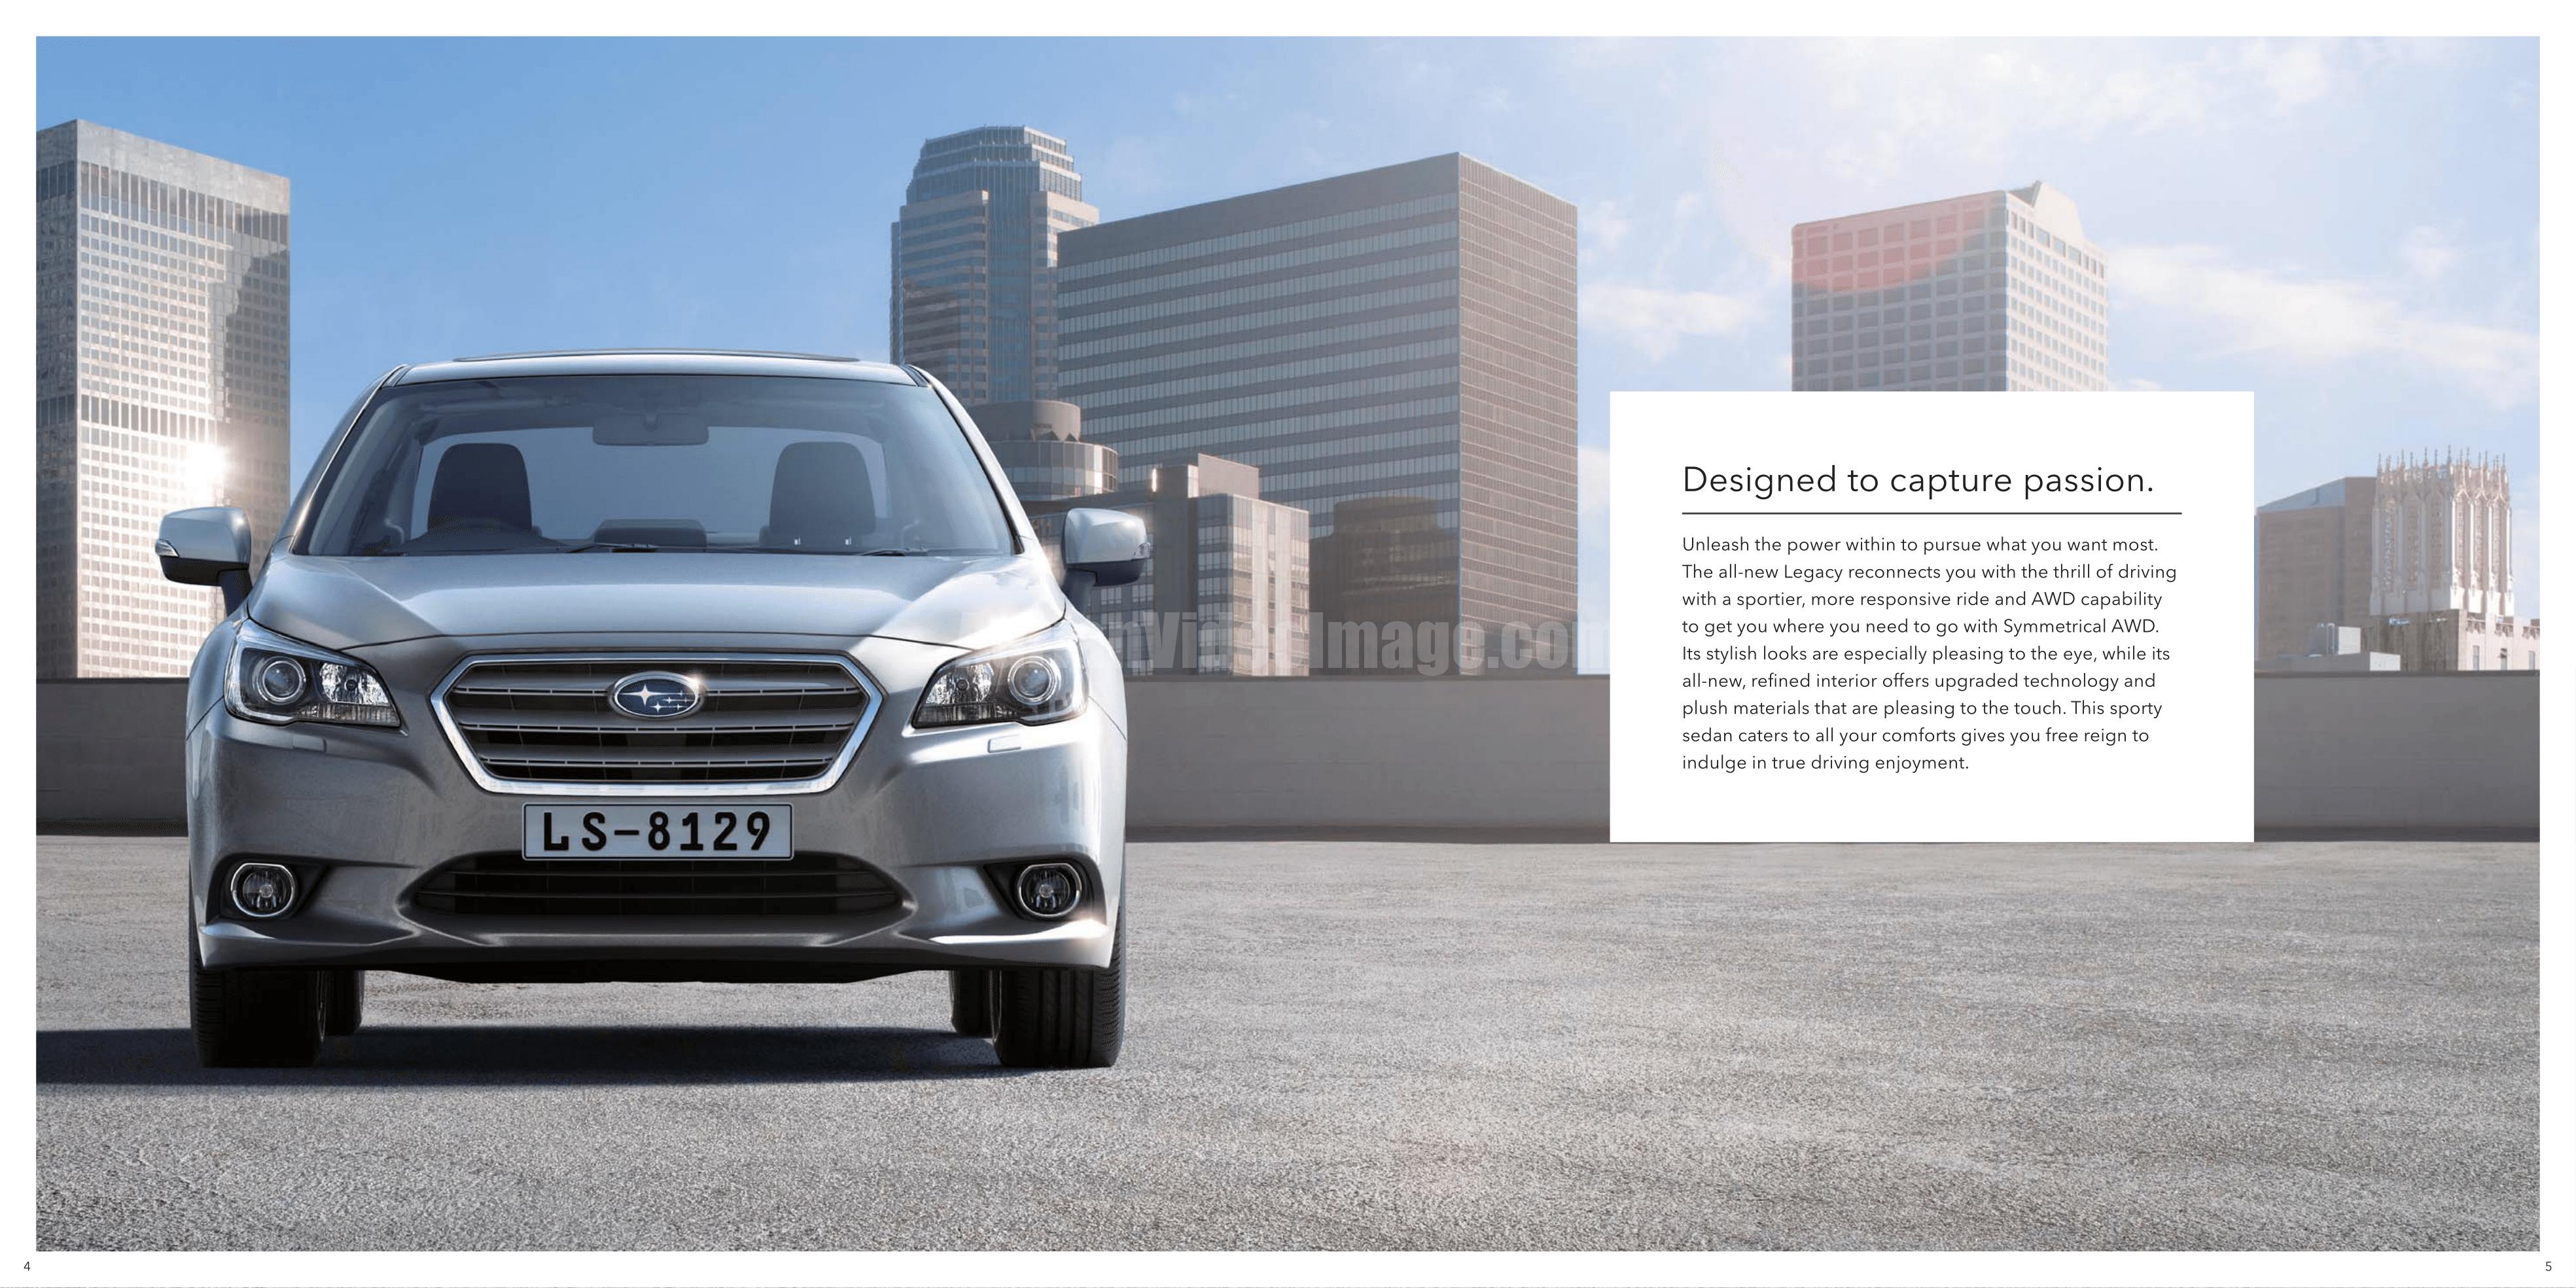 2016 Subaru Legacy - pg-03